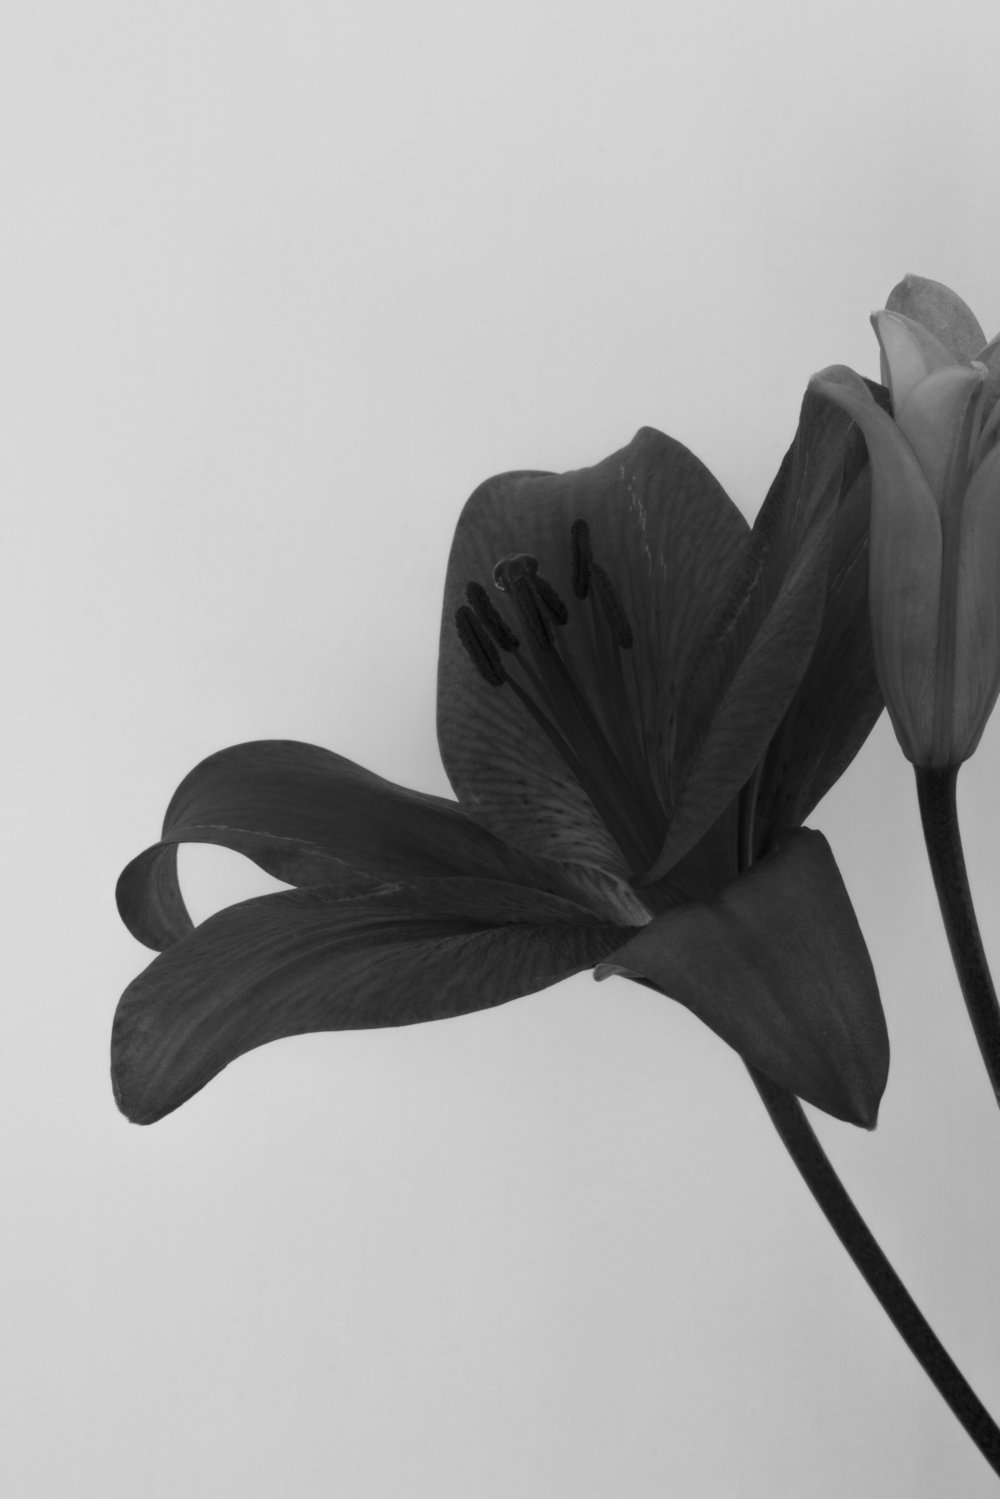 Lilium Hybrid- Red Alert, homage to Robert Mapplethorpe's flowers, 2016